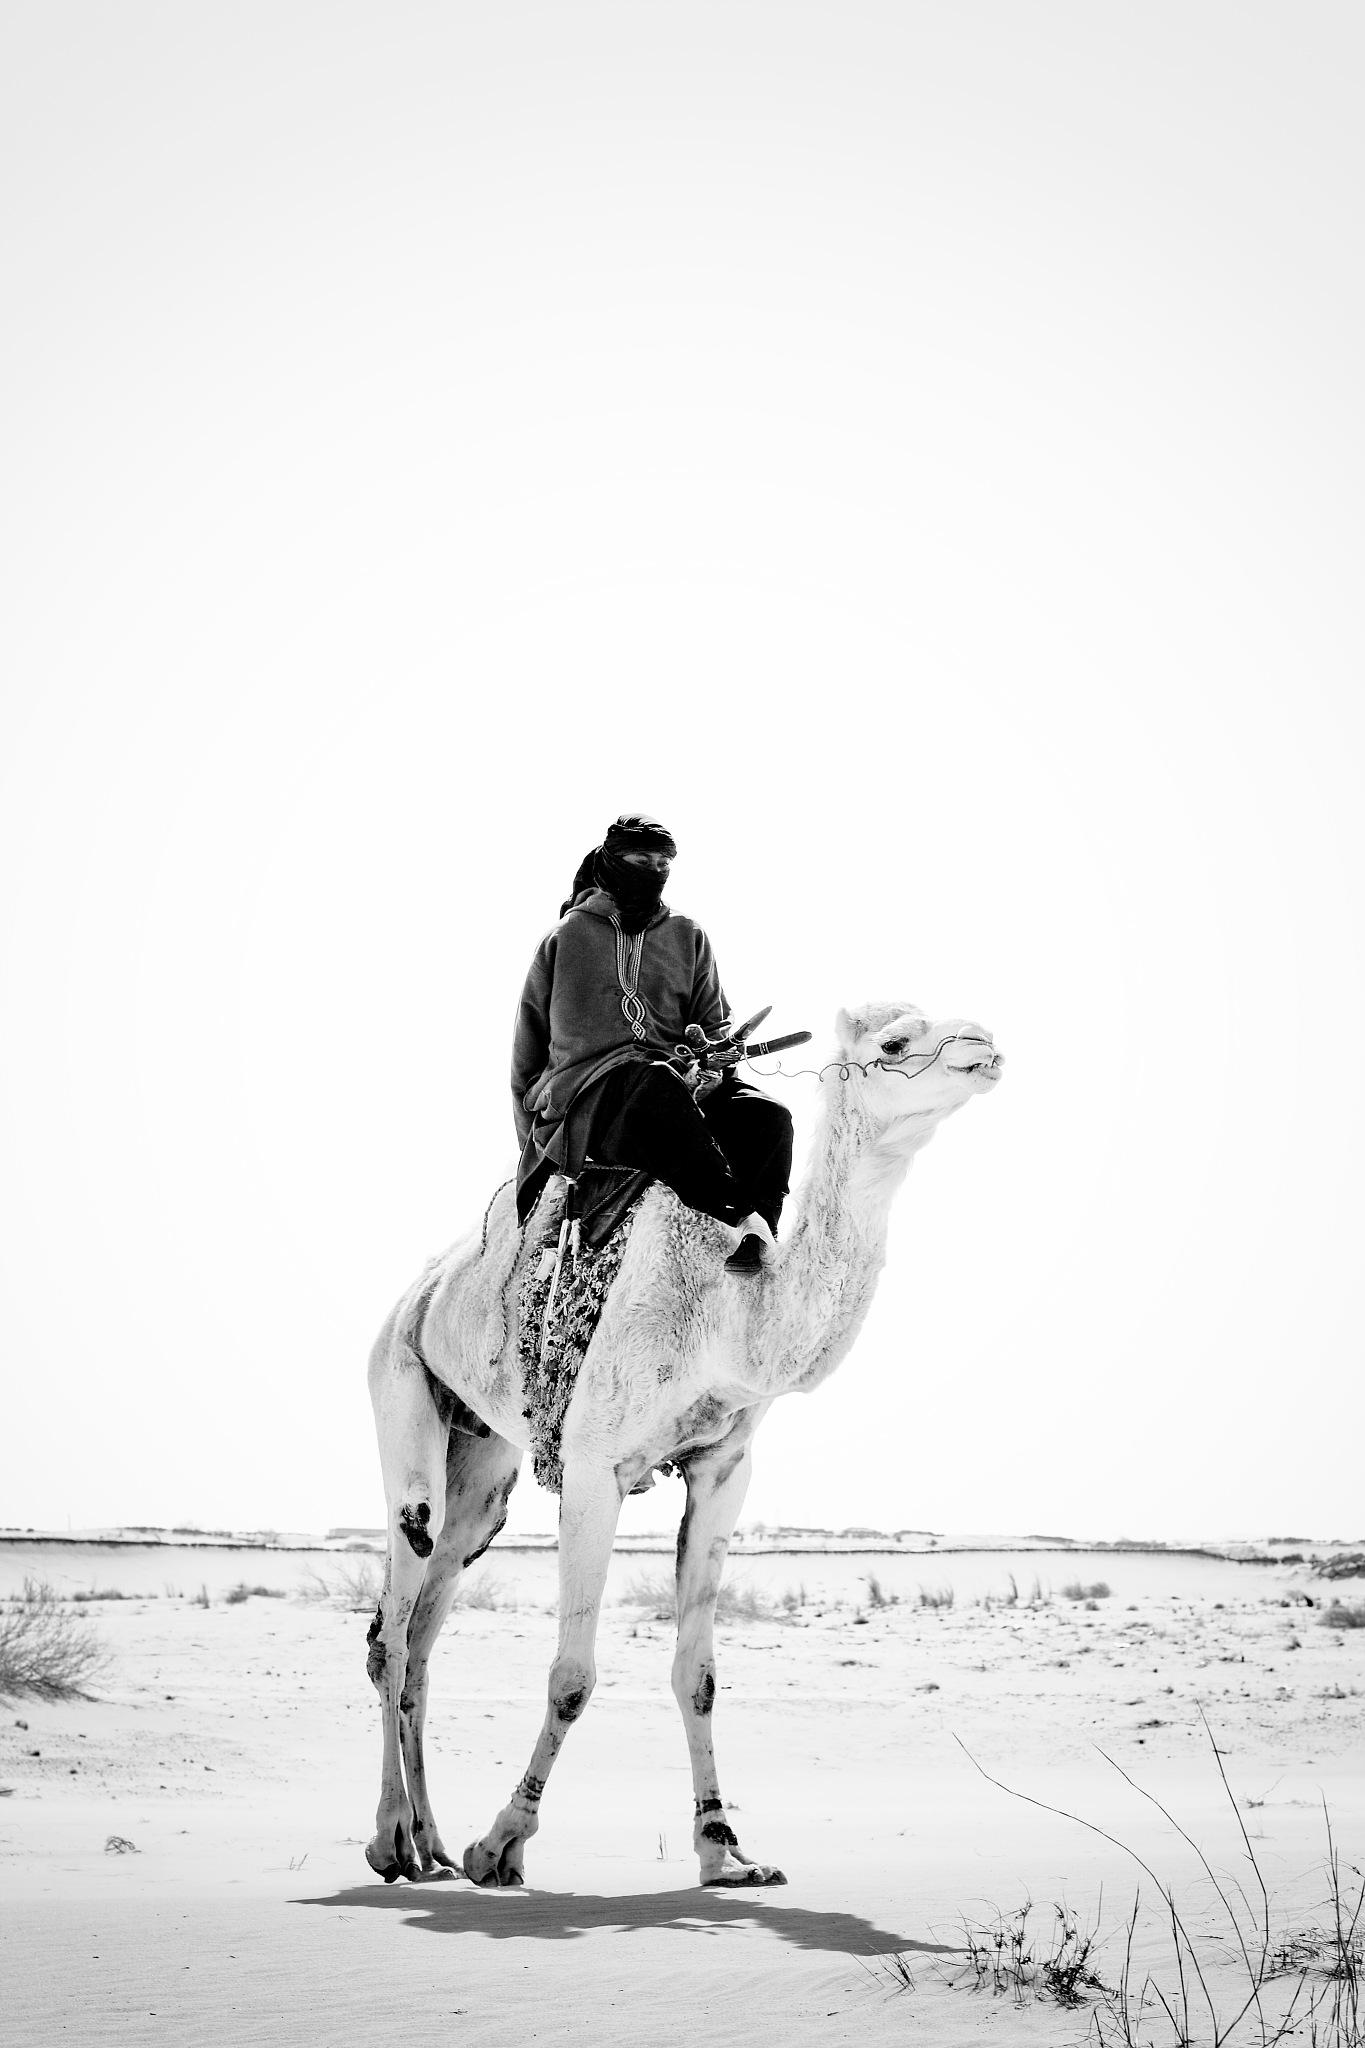 the man of desert by Habit Touche'Art